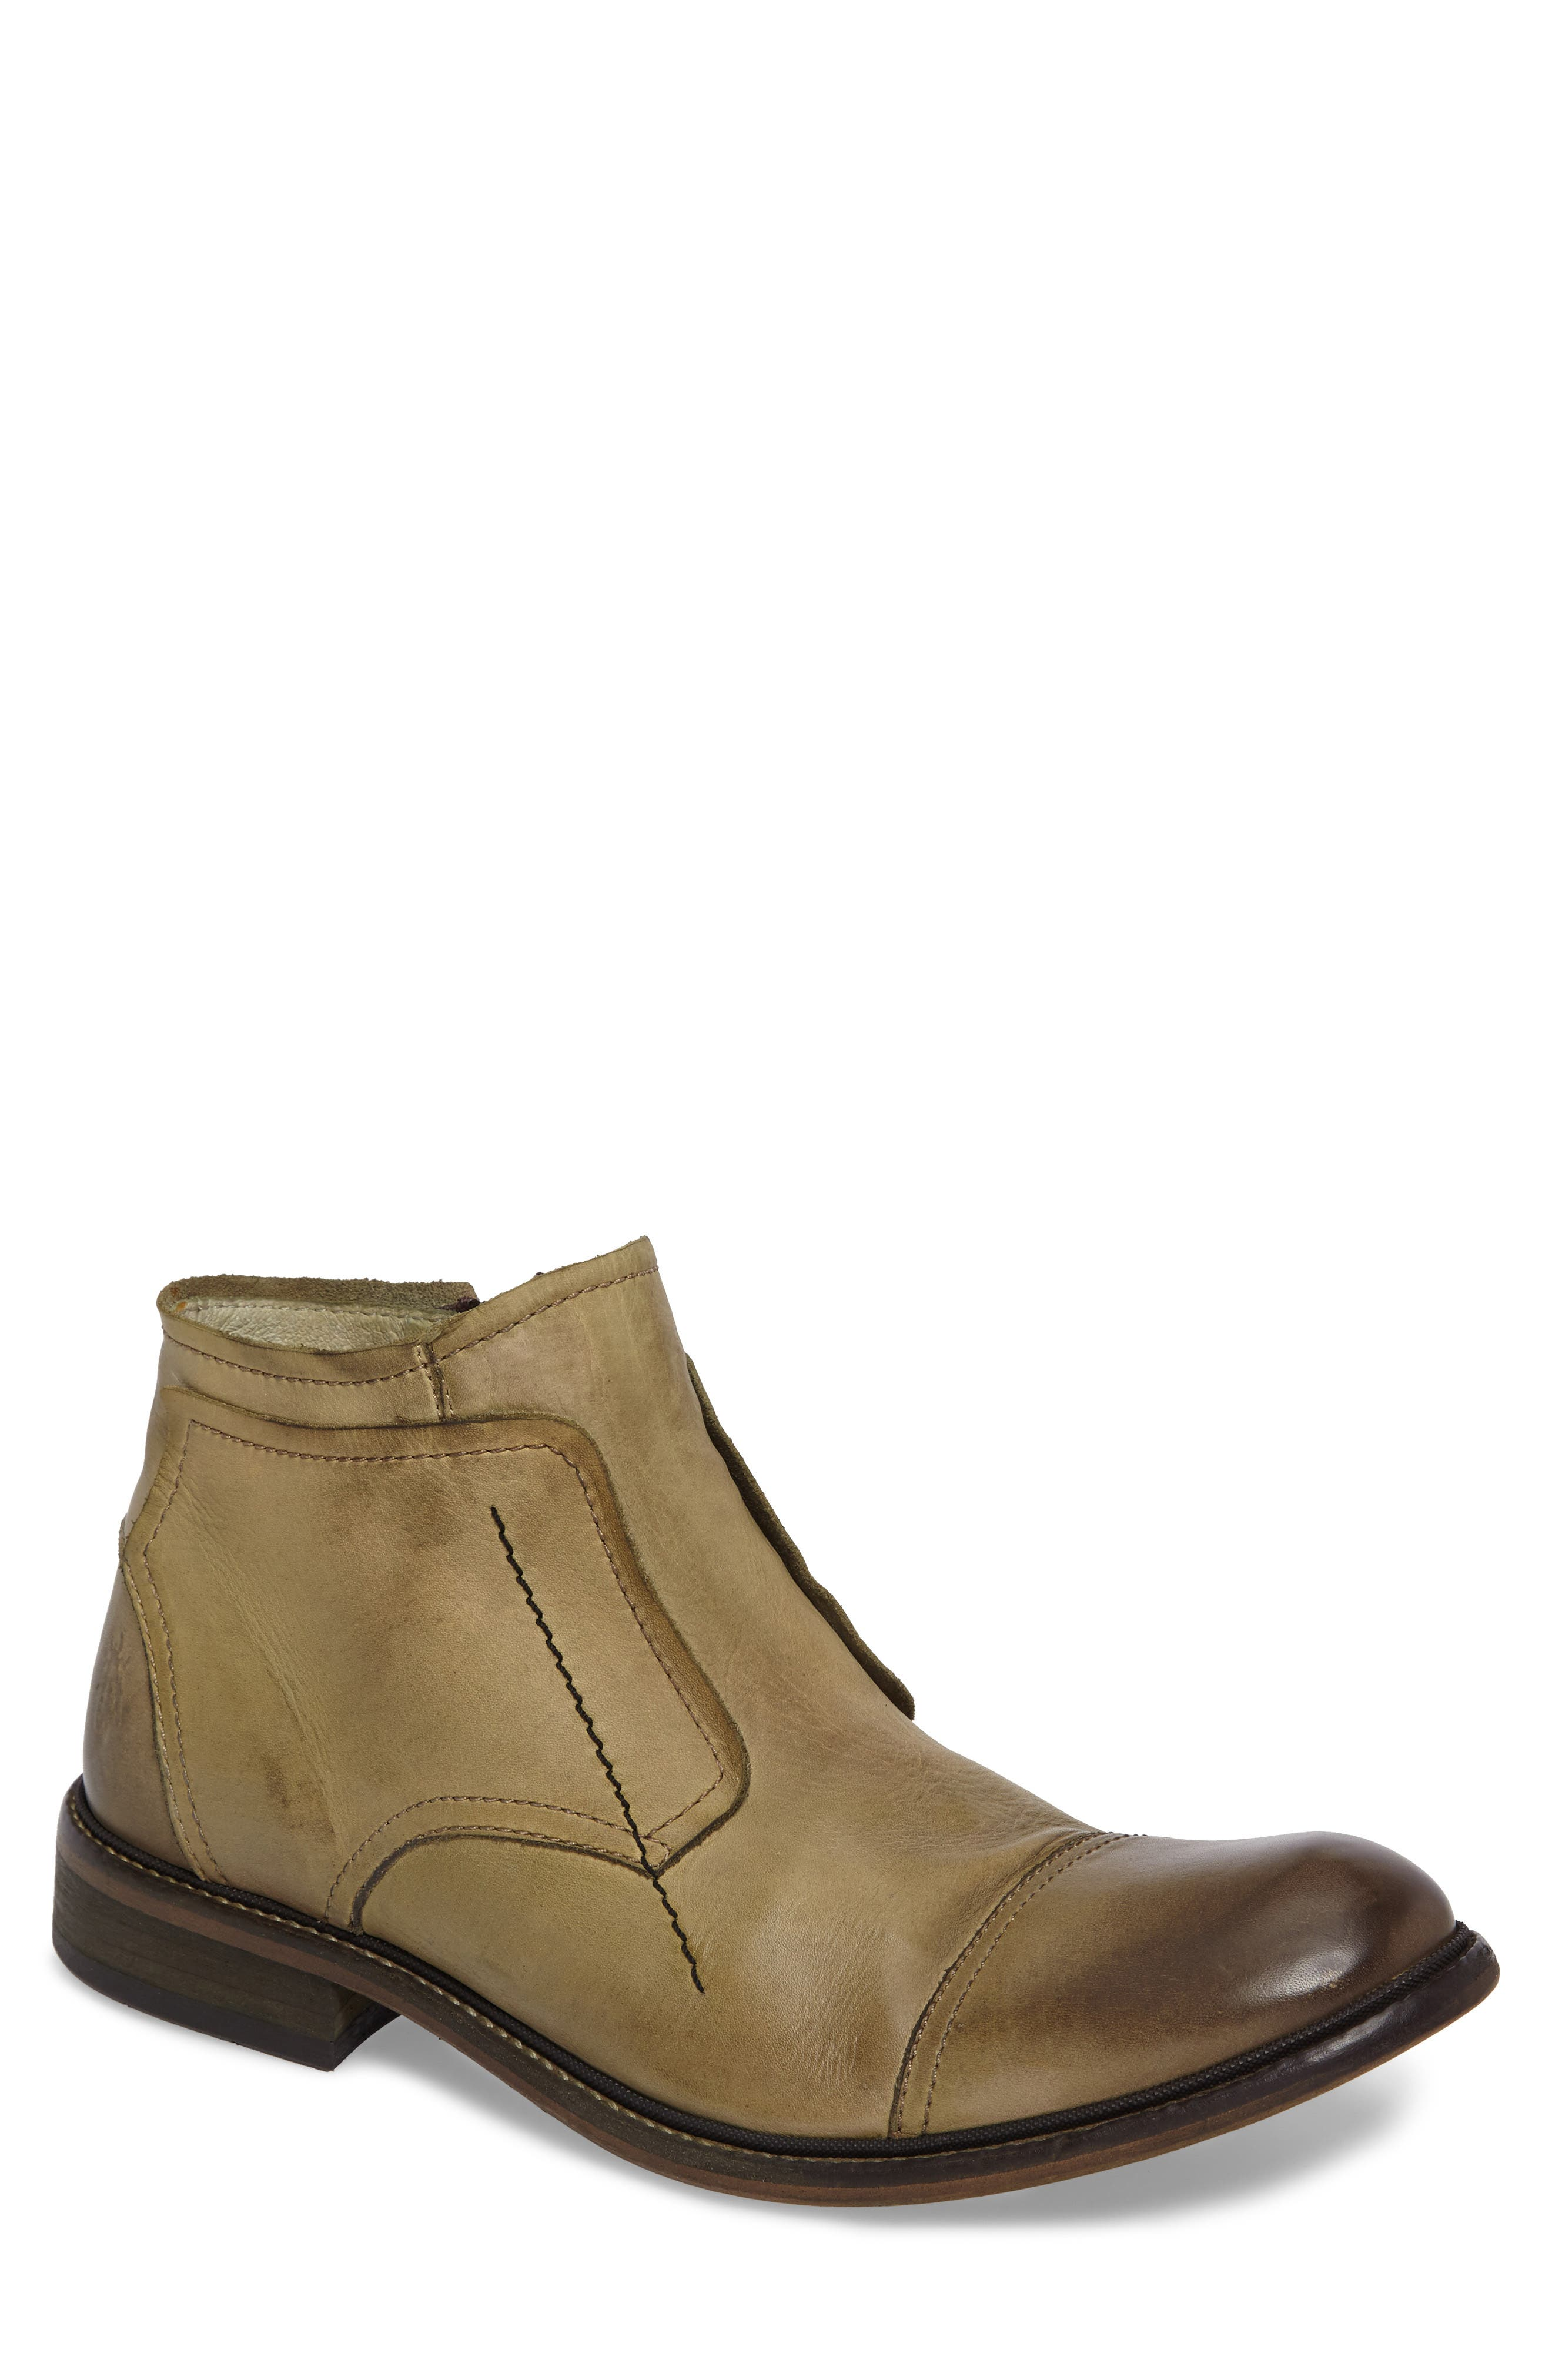 Hale Low Cap Toe Boot,                             Main thumbnail 1, color,                             Salvia